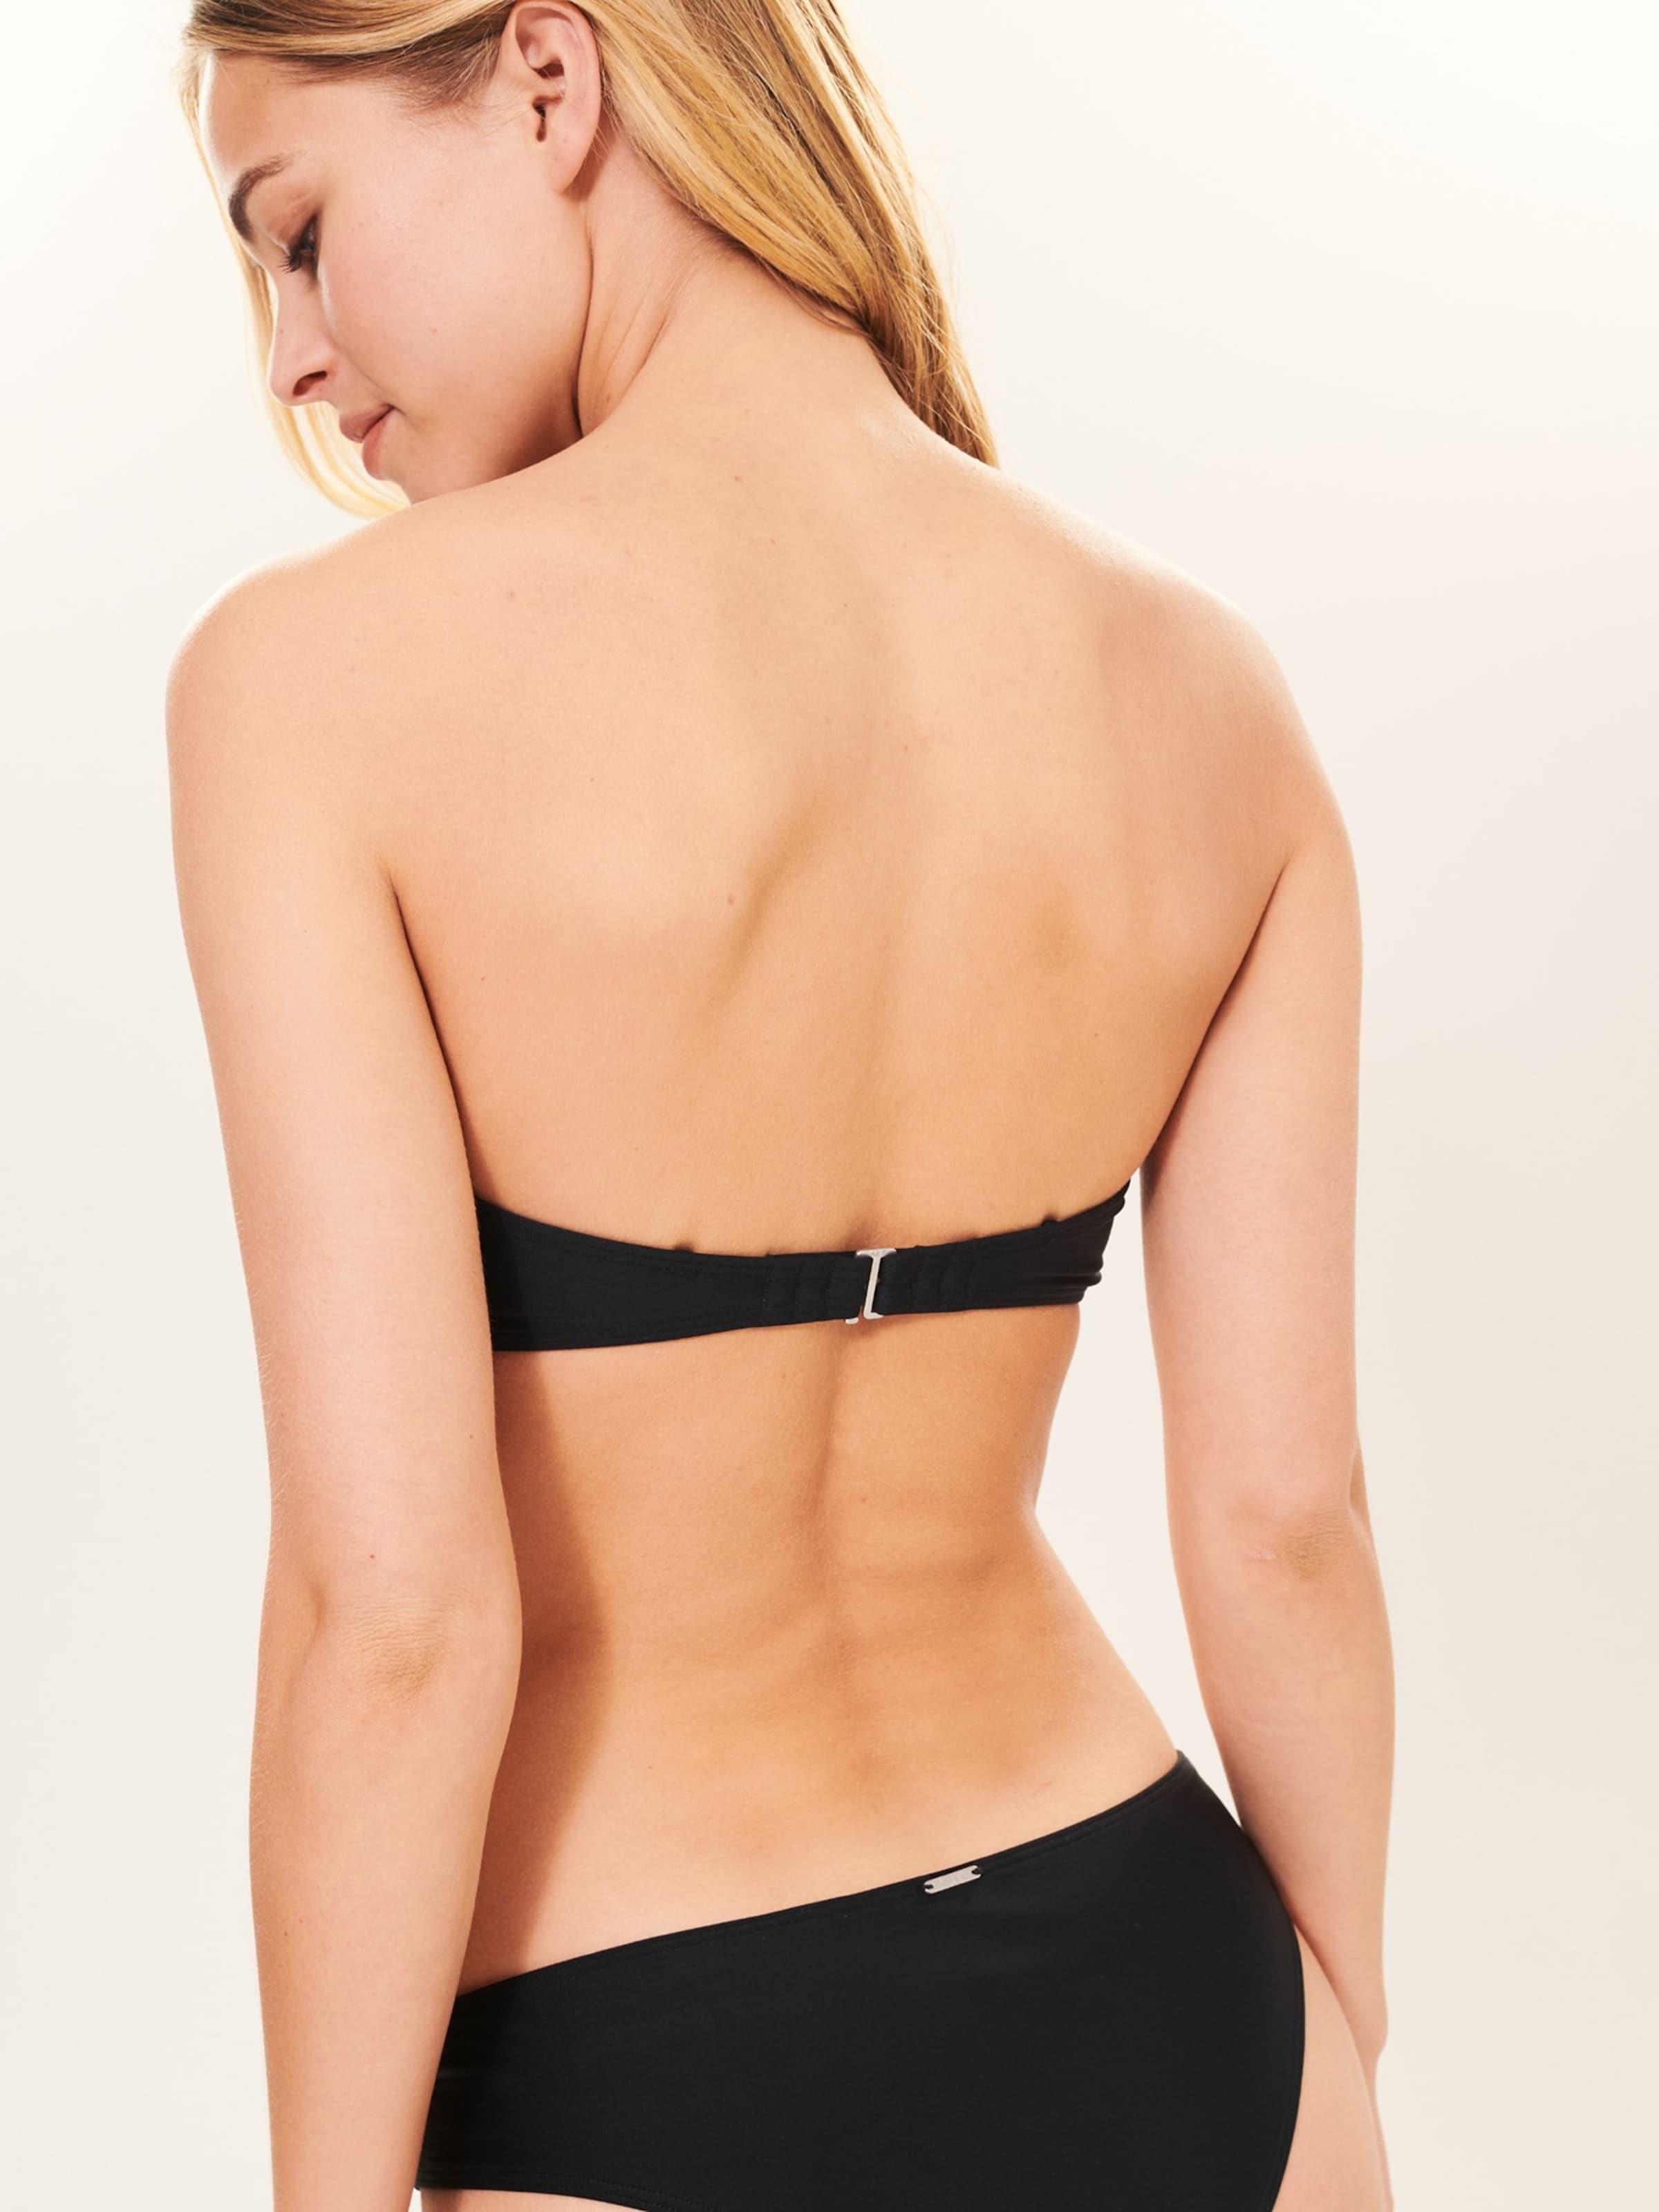 Hauts 'sb19 Bikini Noir Bandeau' Fitch lattice De Abercrombieamp; En kZuiOPXT